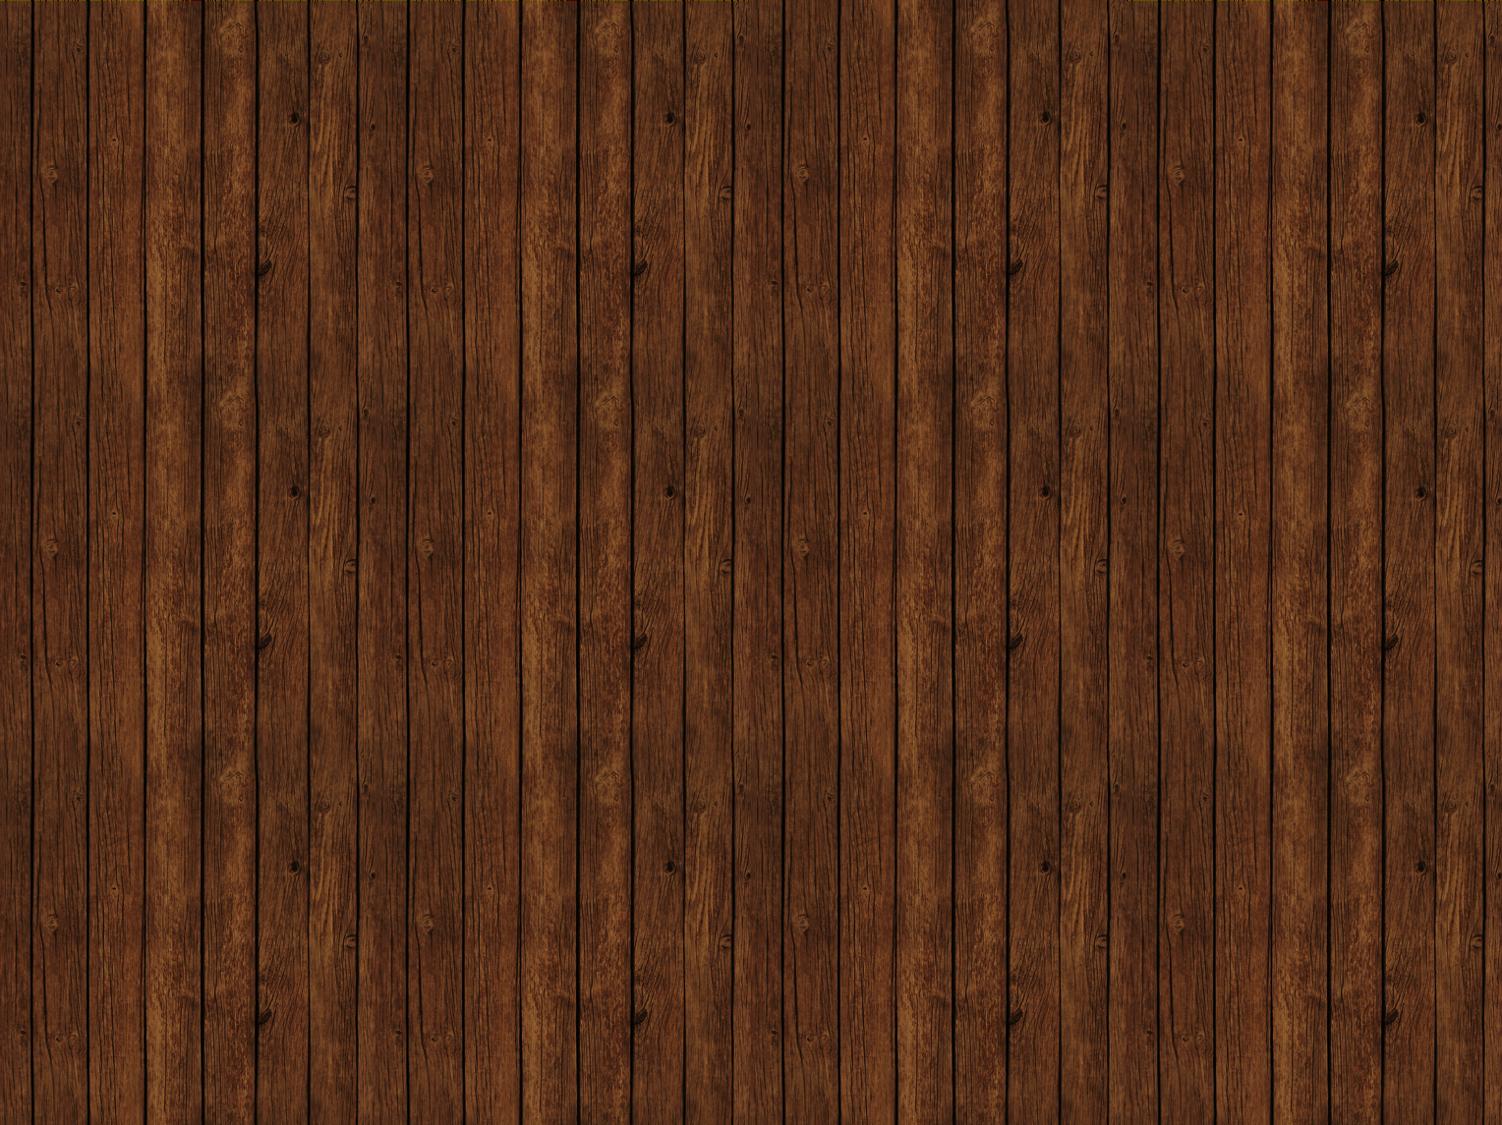 dollhouse wallpaper flooring and brick - photo #41